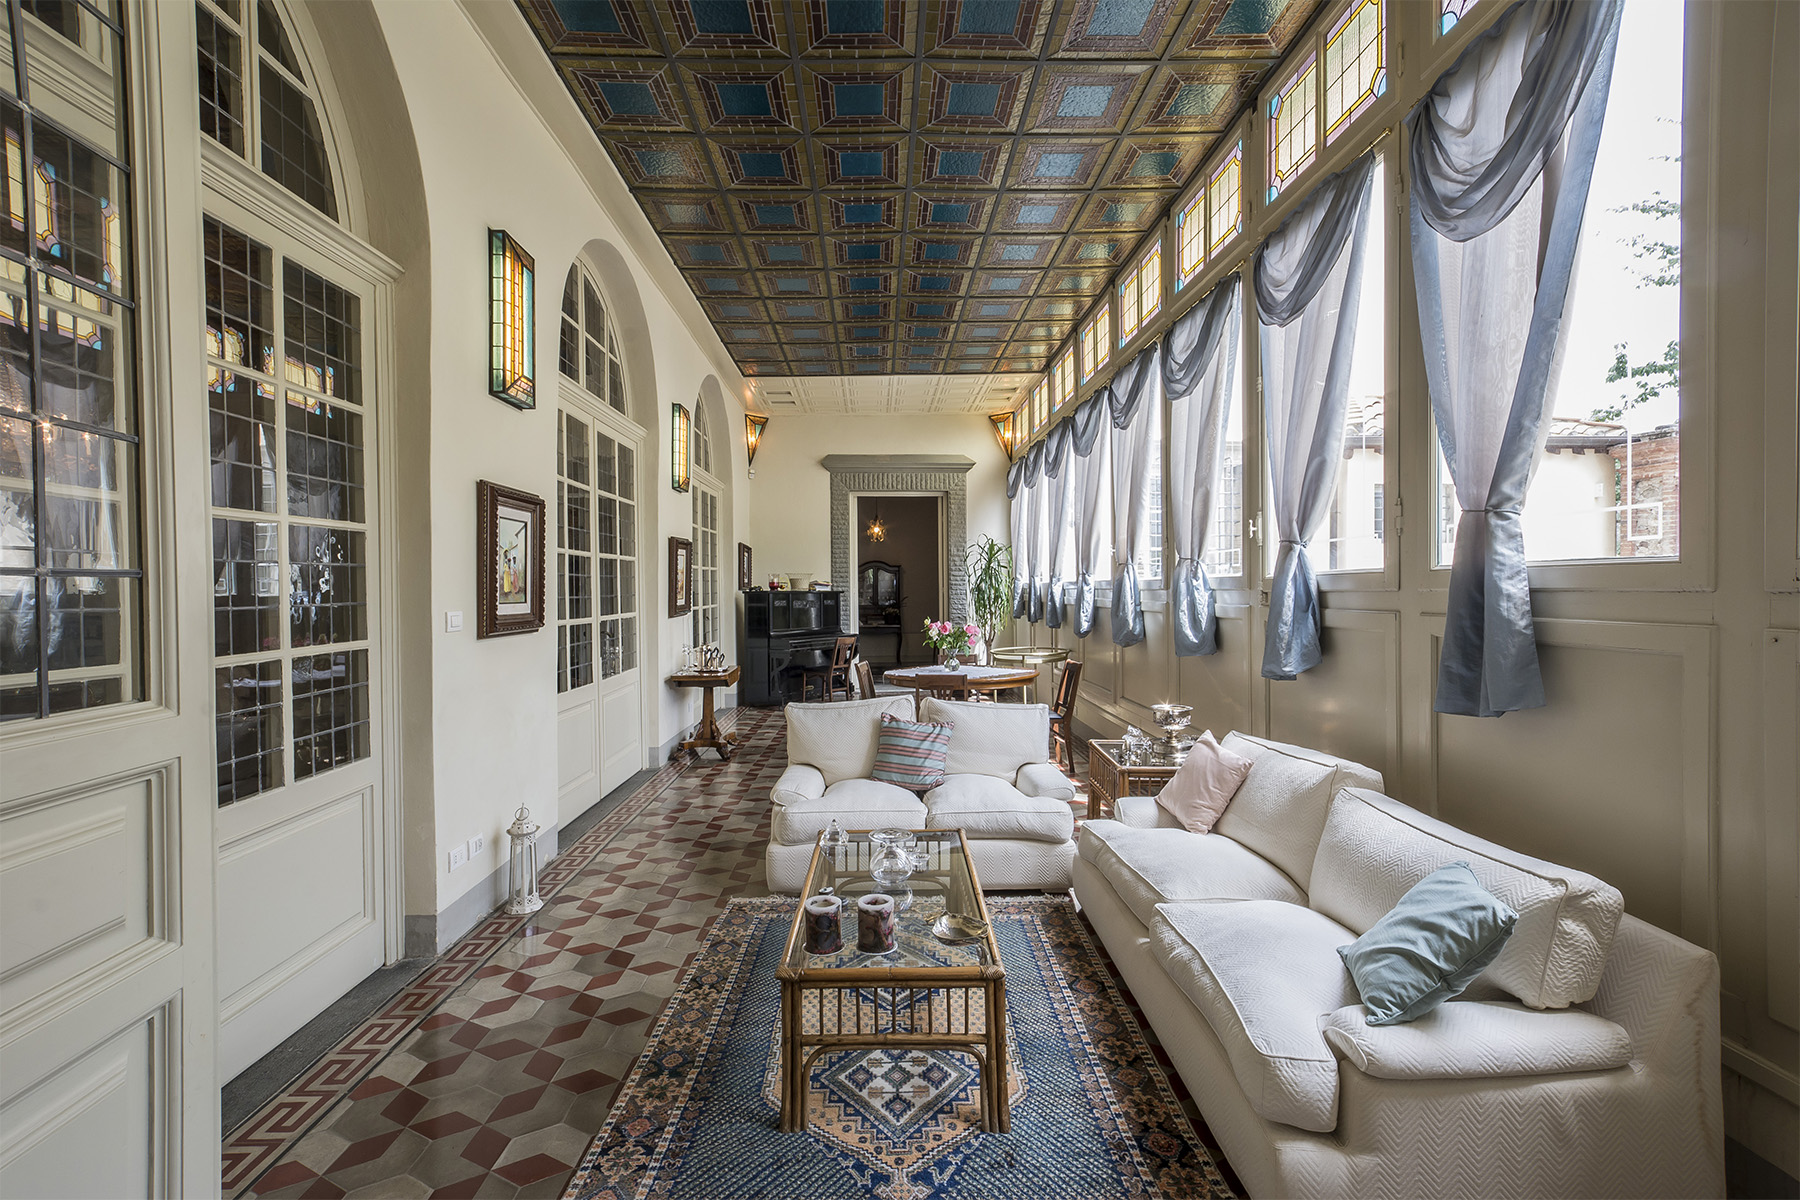 Villa in Vendita a Lucca: 5 locali, 1200 mq - Foto 4